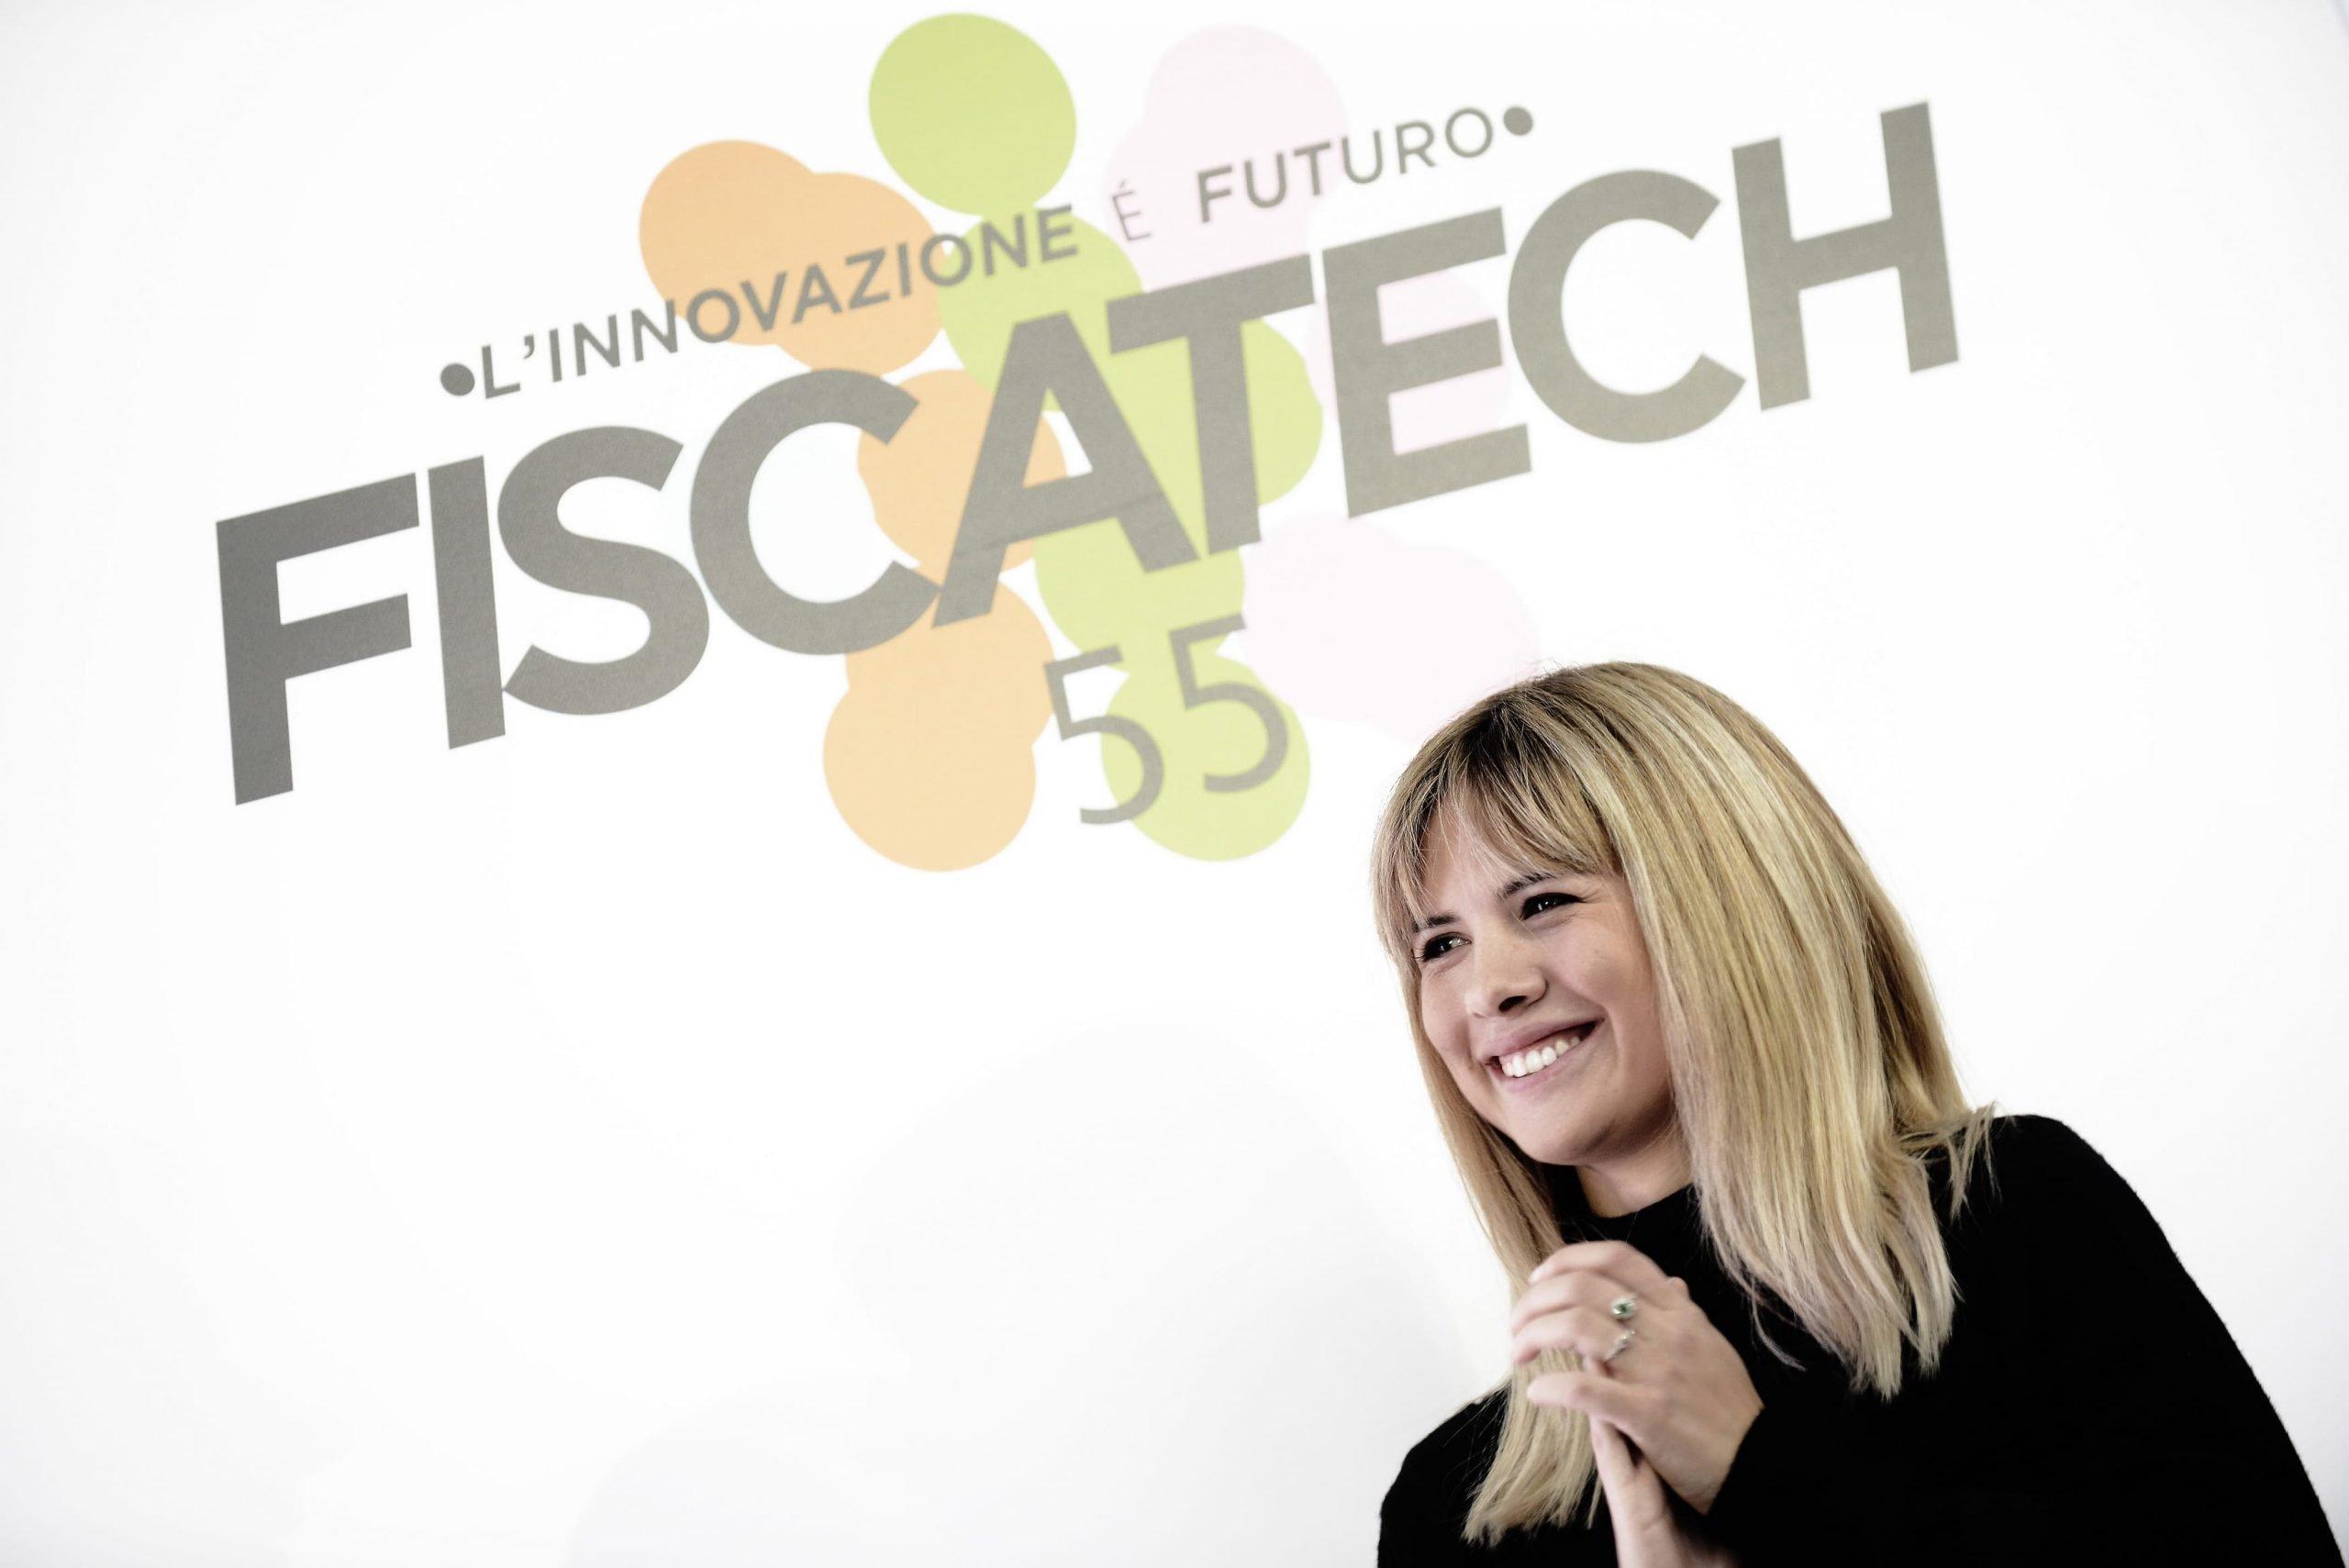 fiscatech-55-foto-3